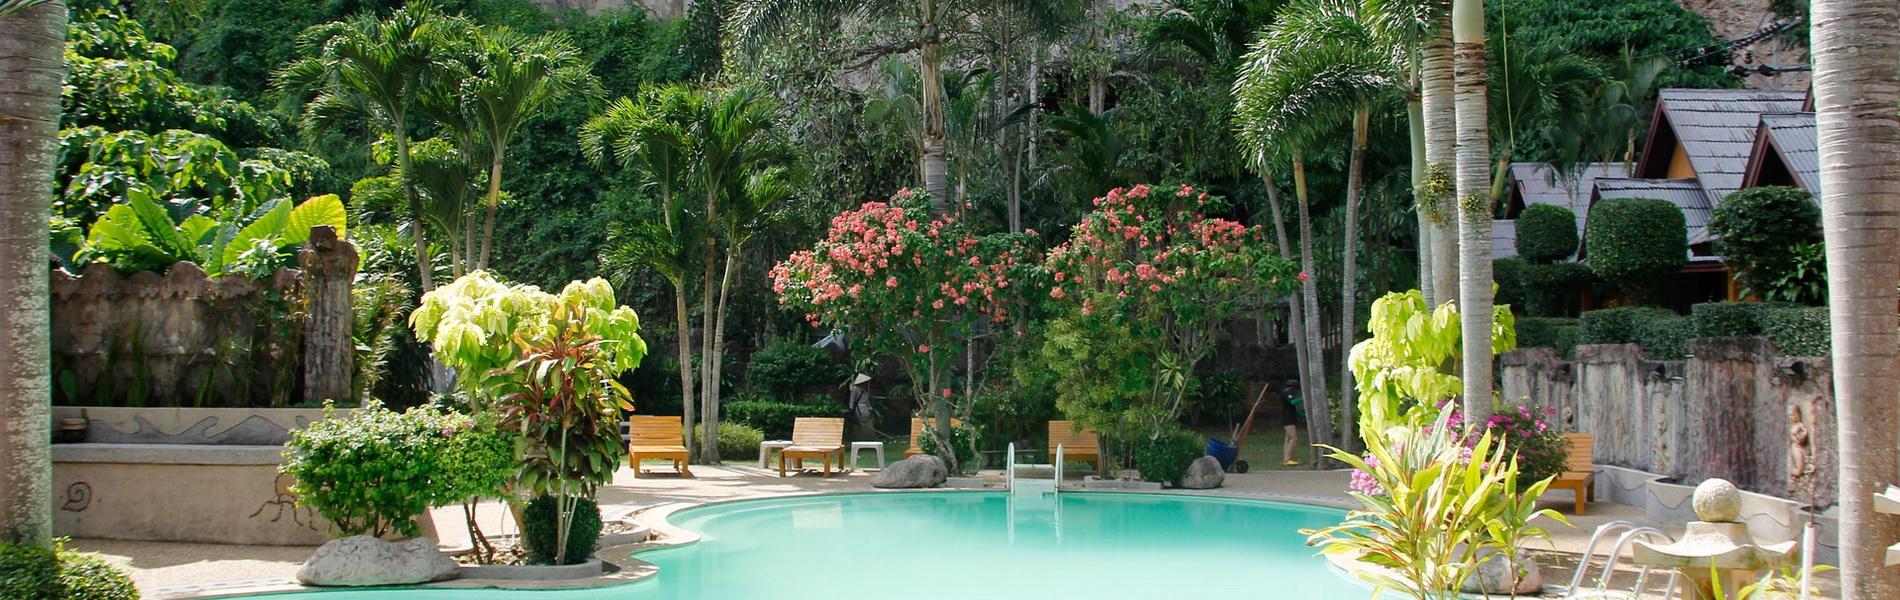 Pool und Dschungel, CC0 Creative Commons